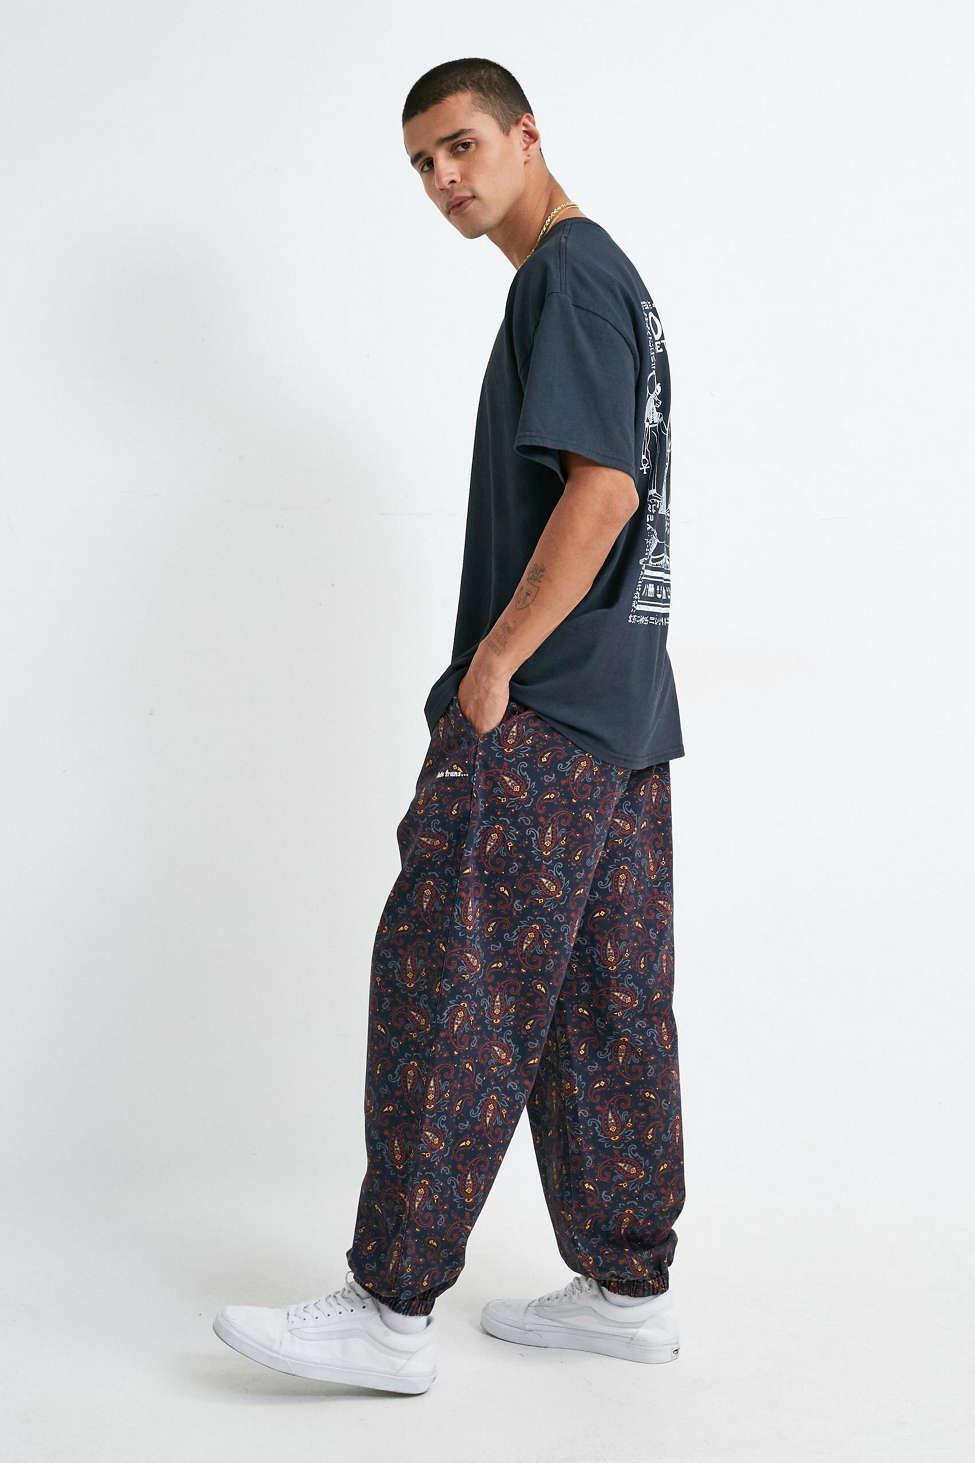 Xanders Shopping Jumpsuit Short Sleeves Rompers